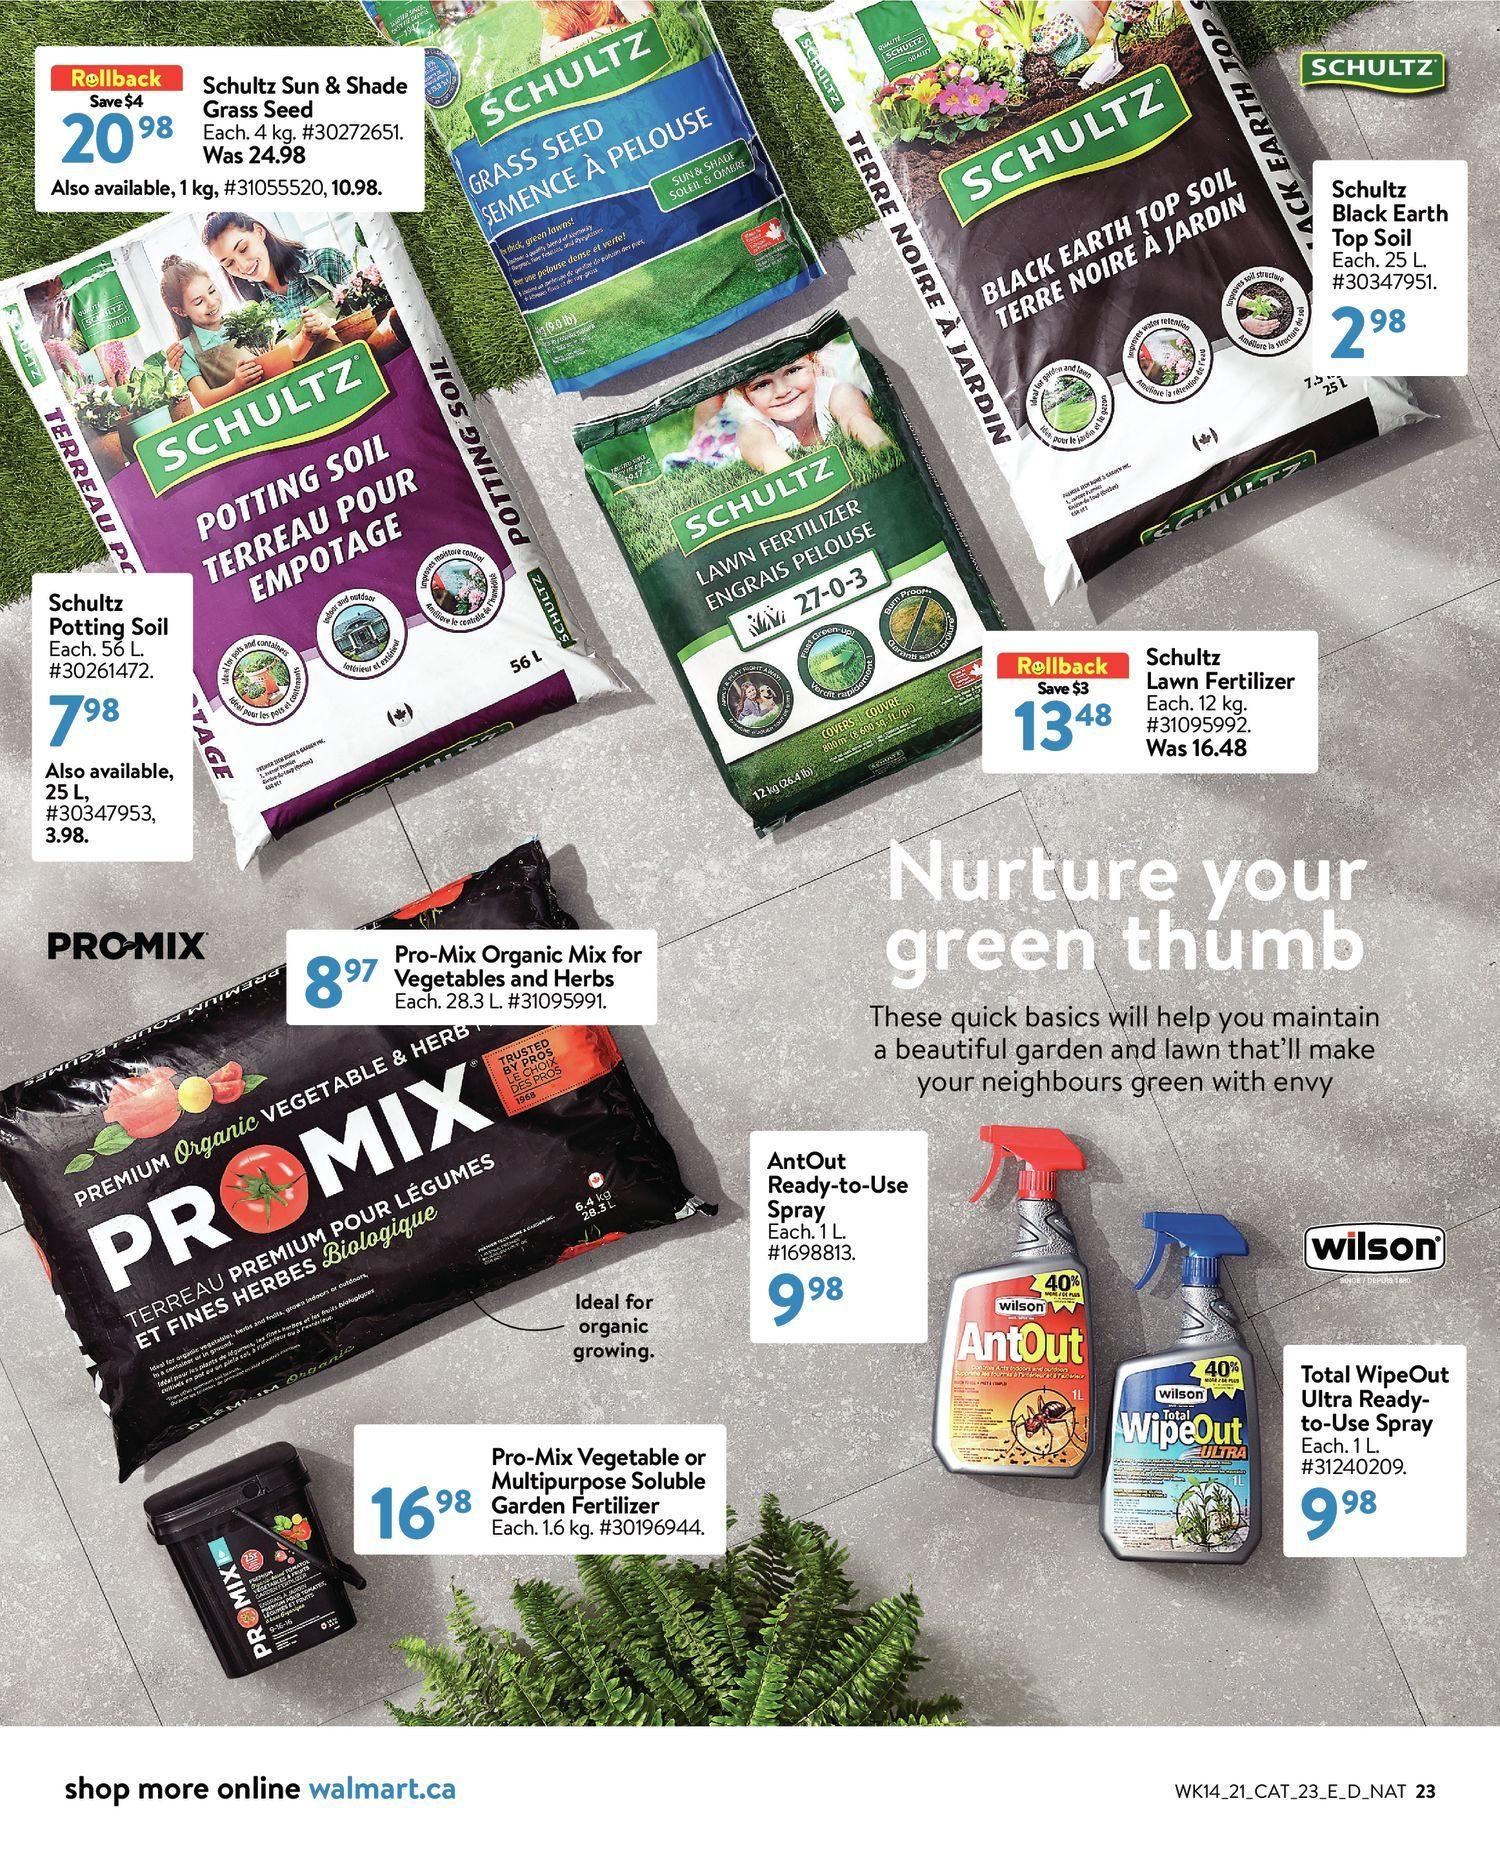 Walmart - Weekends Book - Page 23